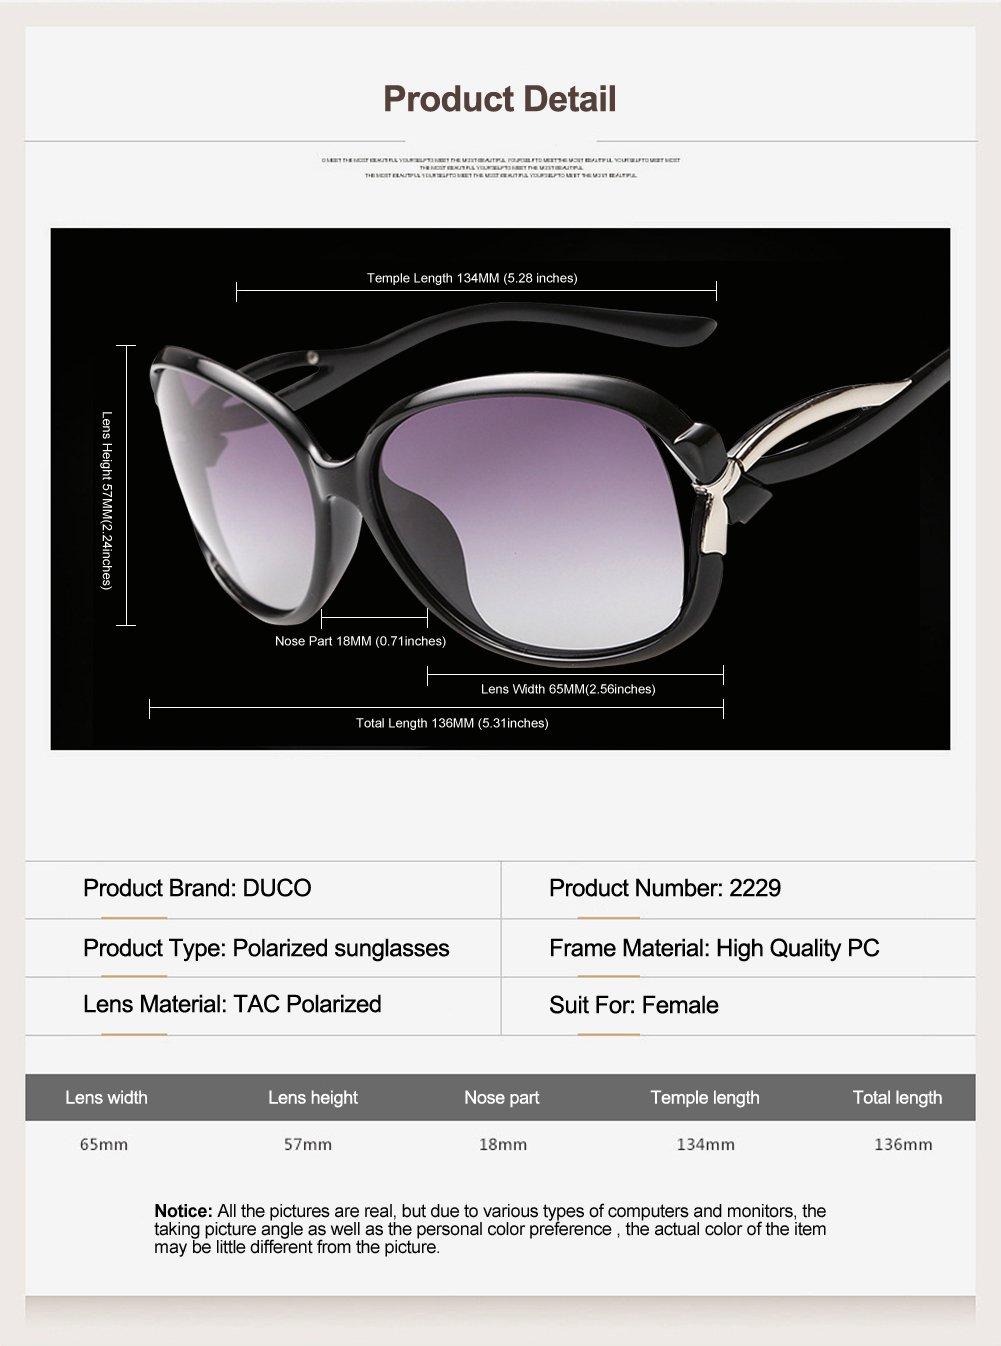 d1d333d1ca Duco Womens Stylish Polarized Sunglasses Star Glasses 100 % UV Protection  2229  (Purple